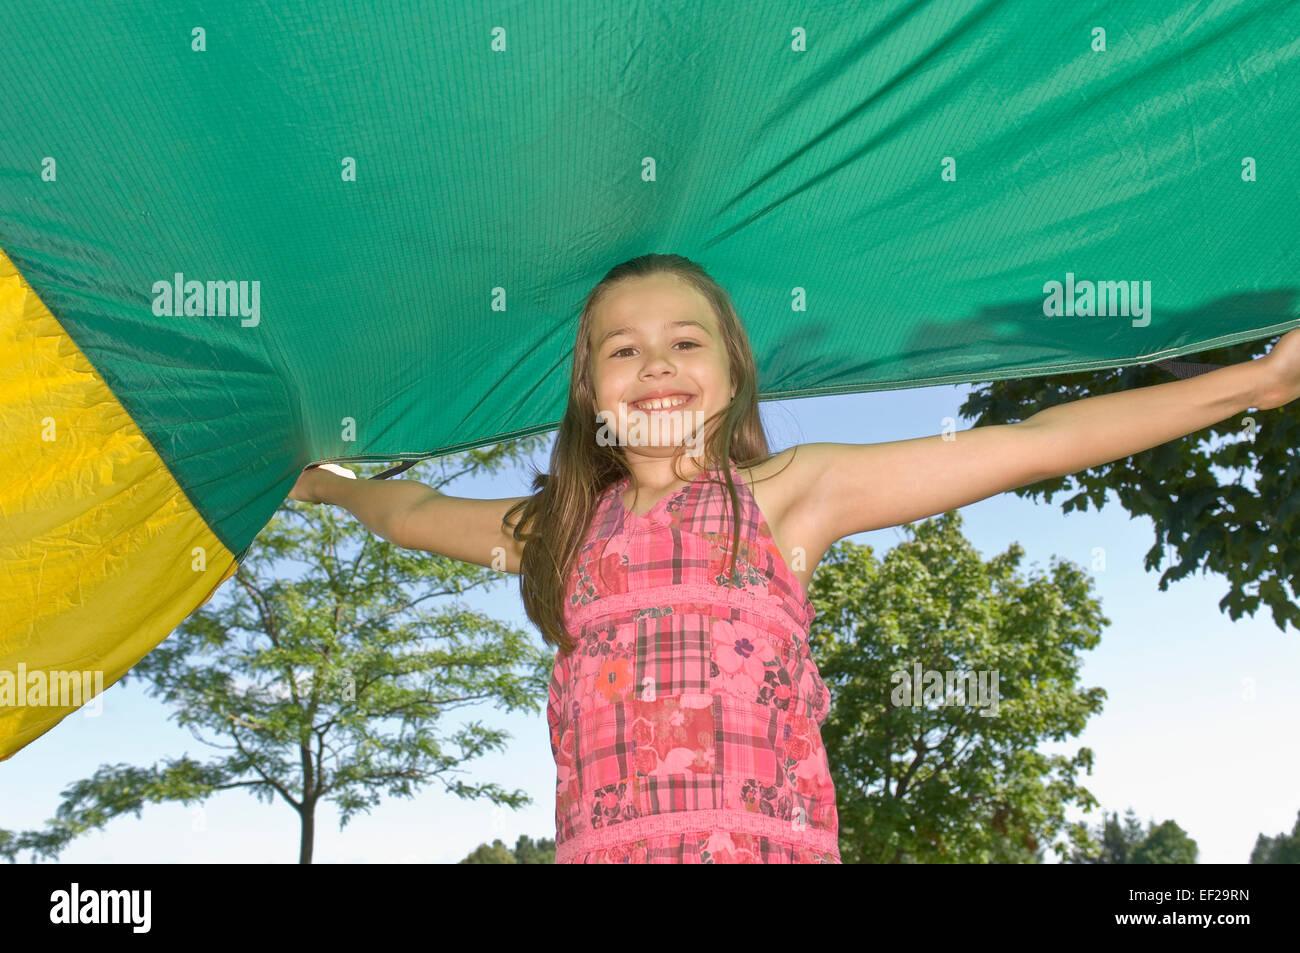 Chica pararse bajo un paracaídas Foto de stock